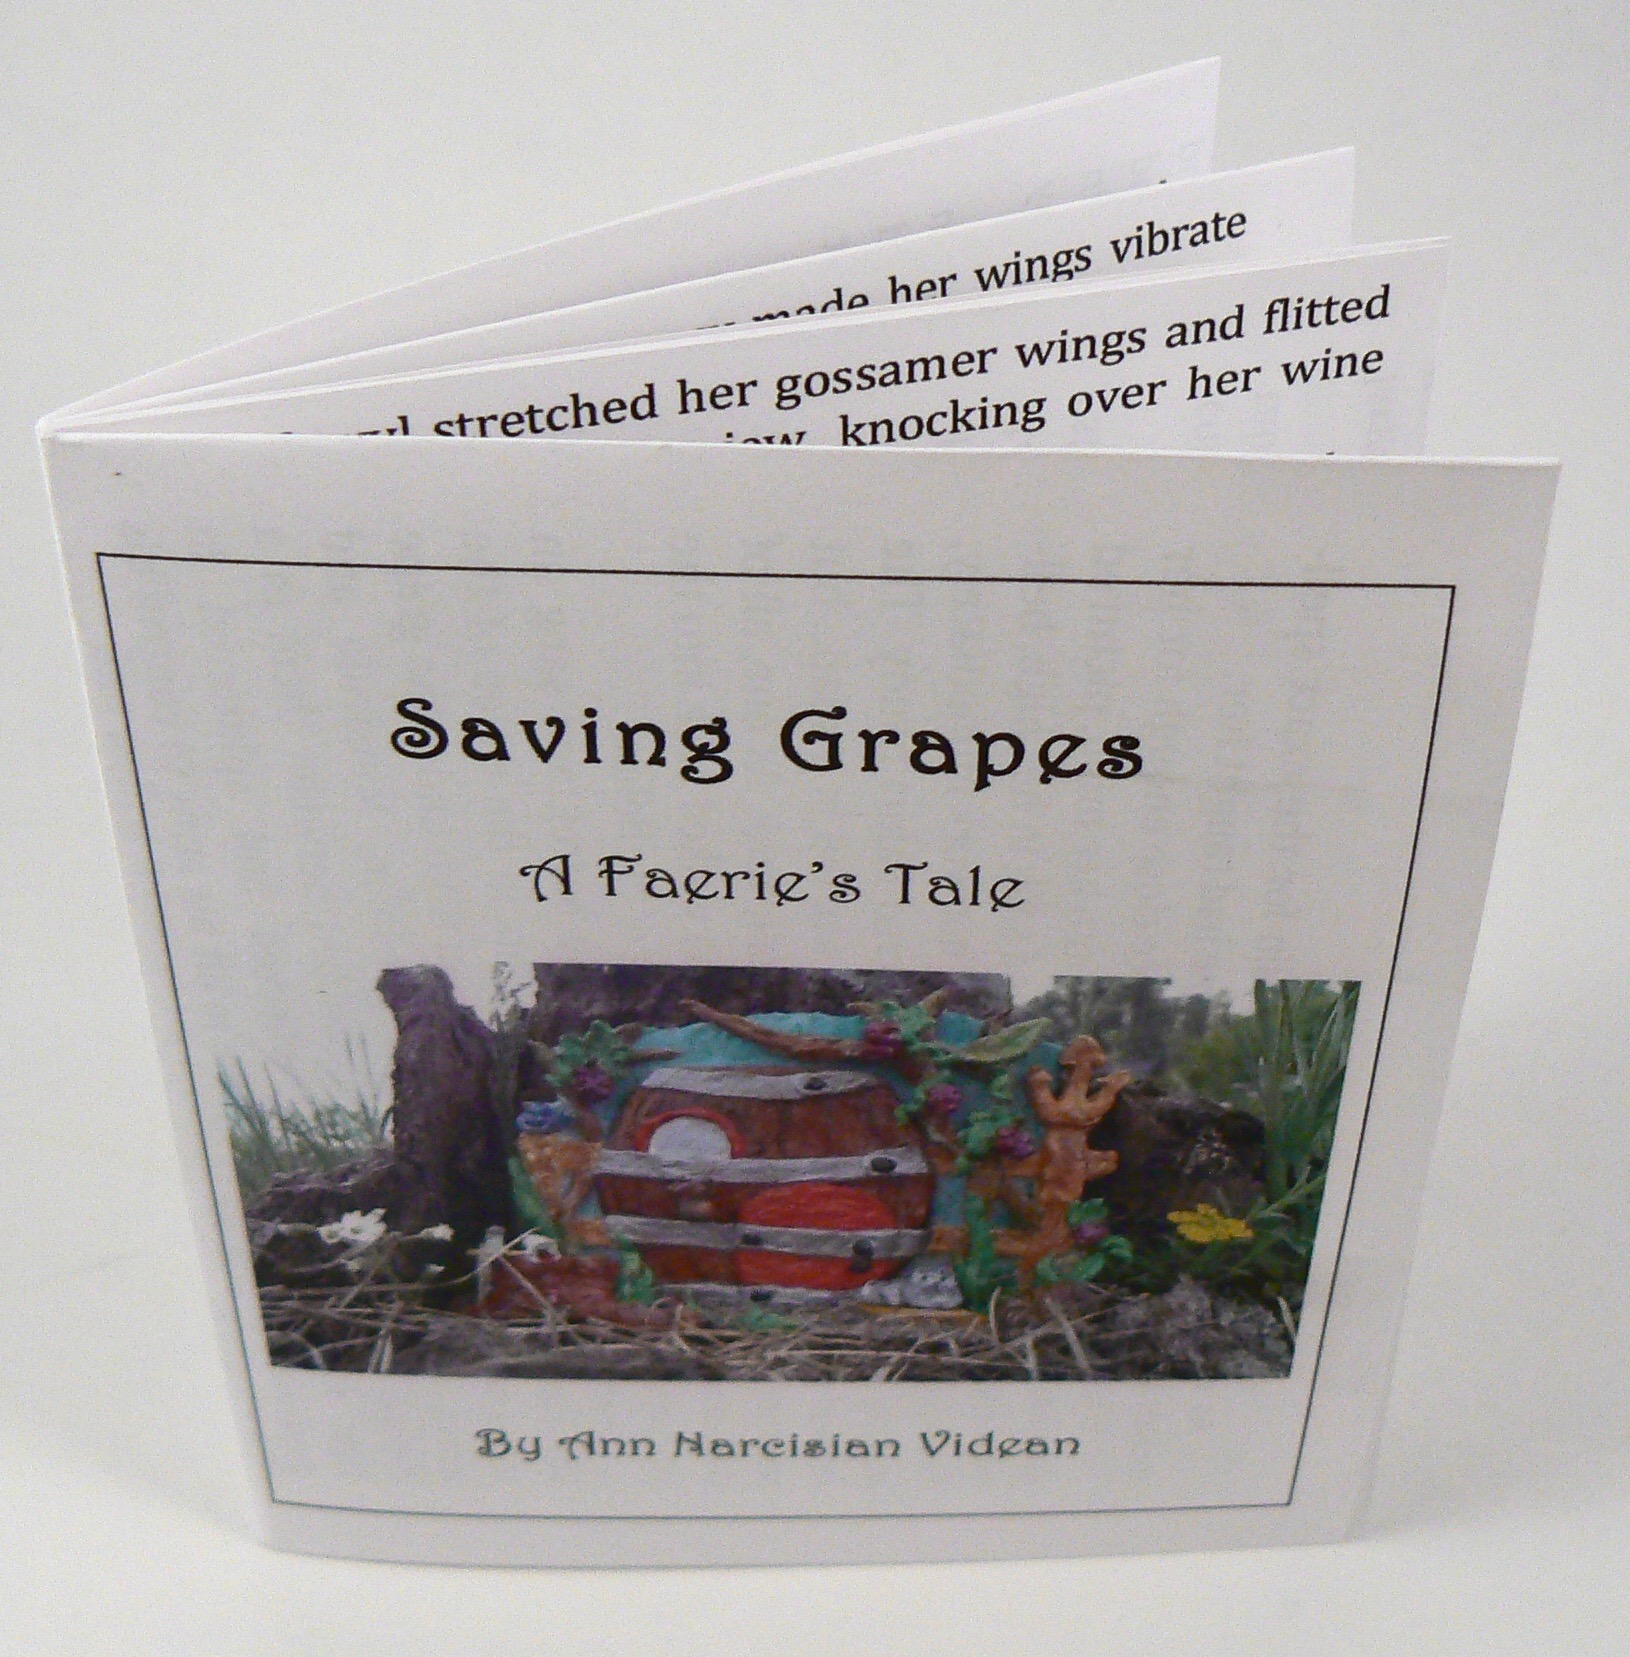 WhimsyC.booklet.SavingGrapes.dcu.2.jpg